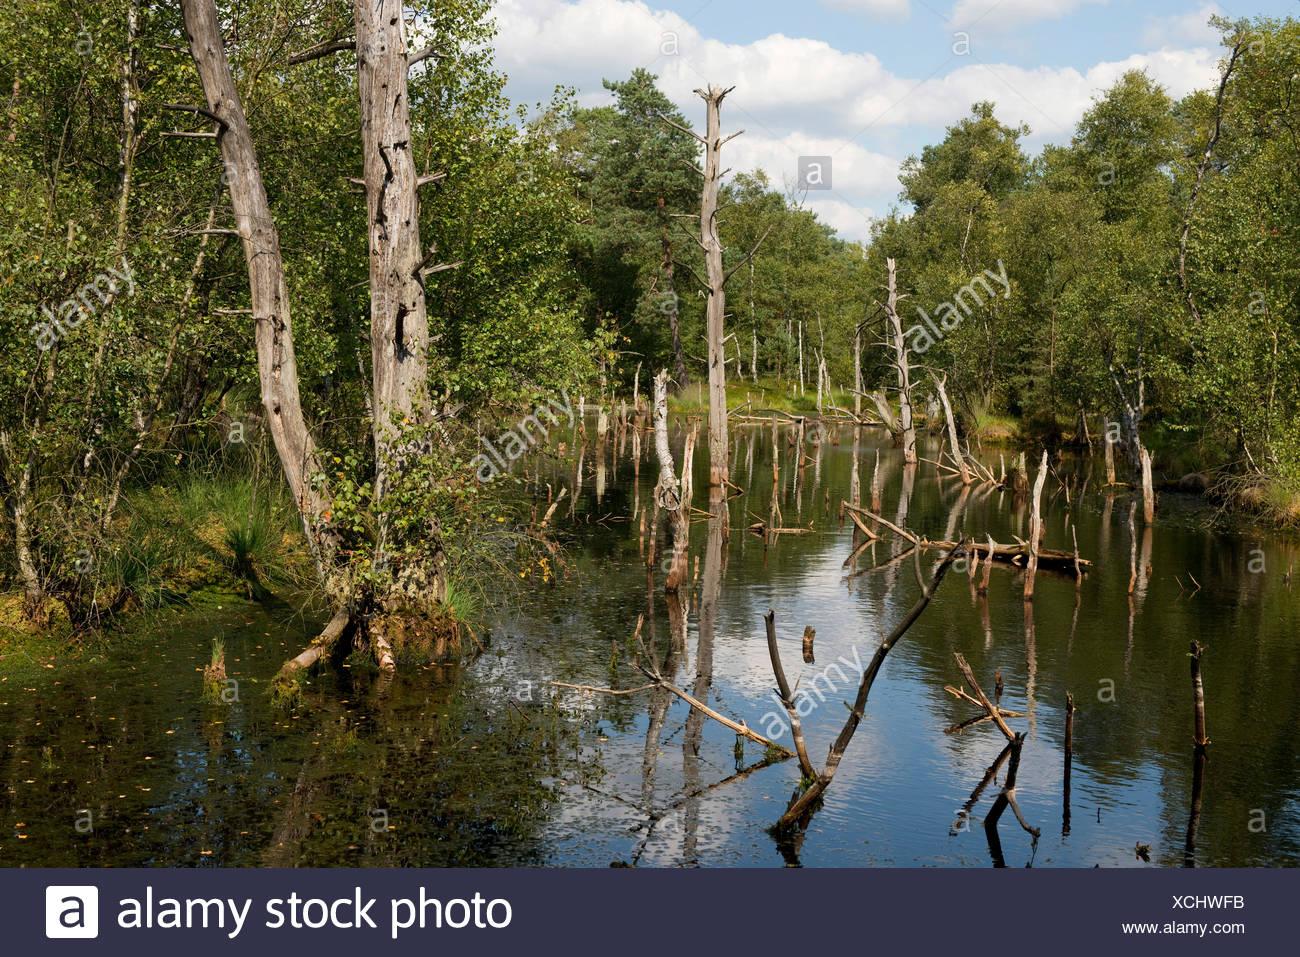 Pietzmoor, Lüneburg Heath Nature Reserve, Schneverdingen, Lower Saxony, Germany - Stock Image